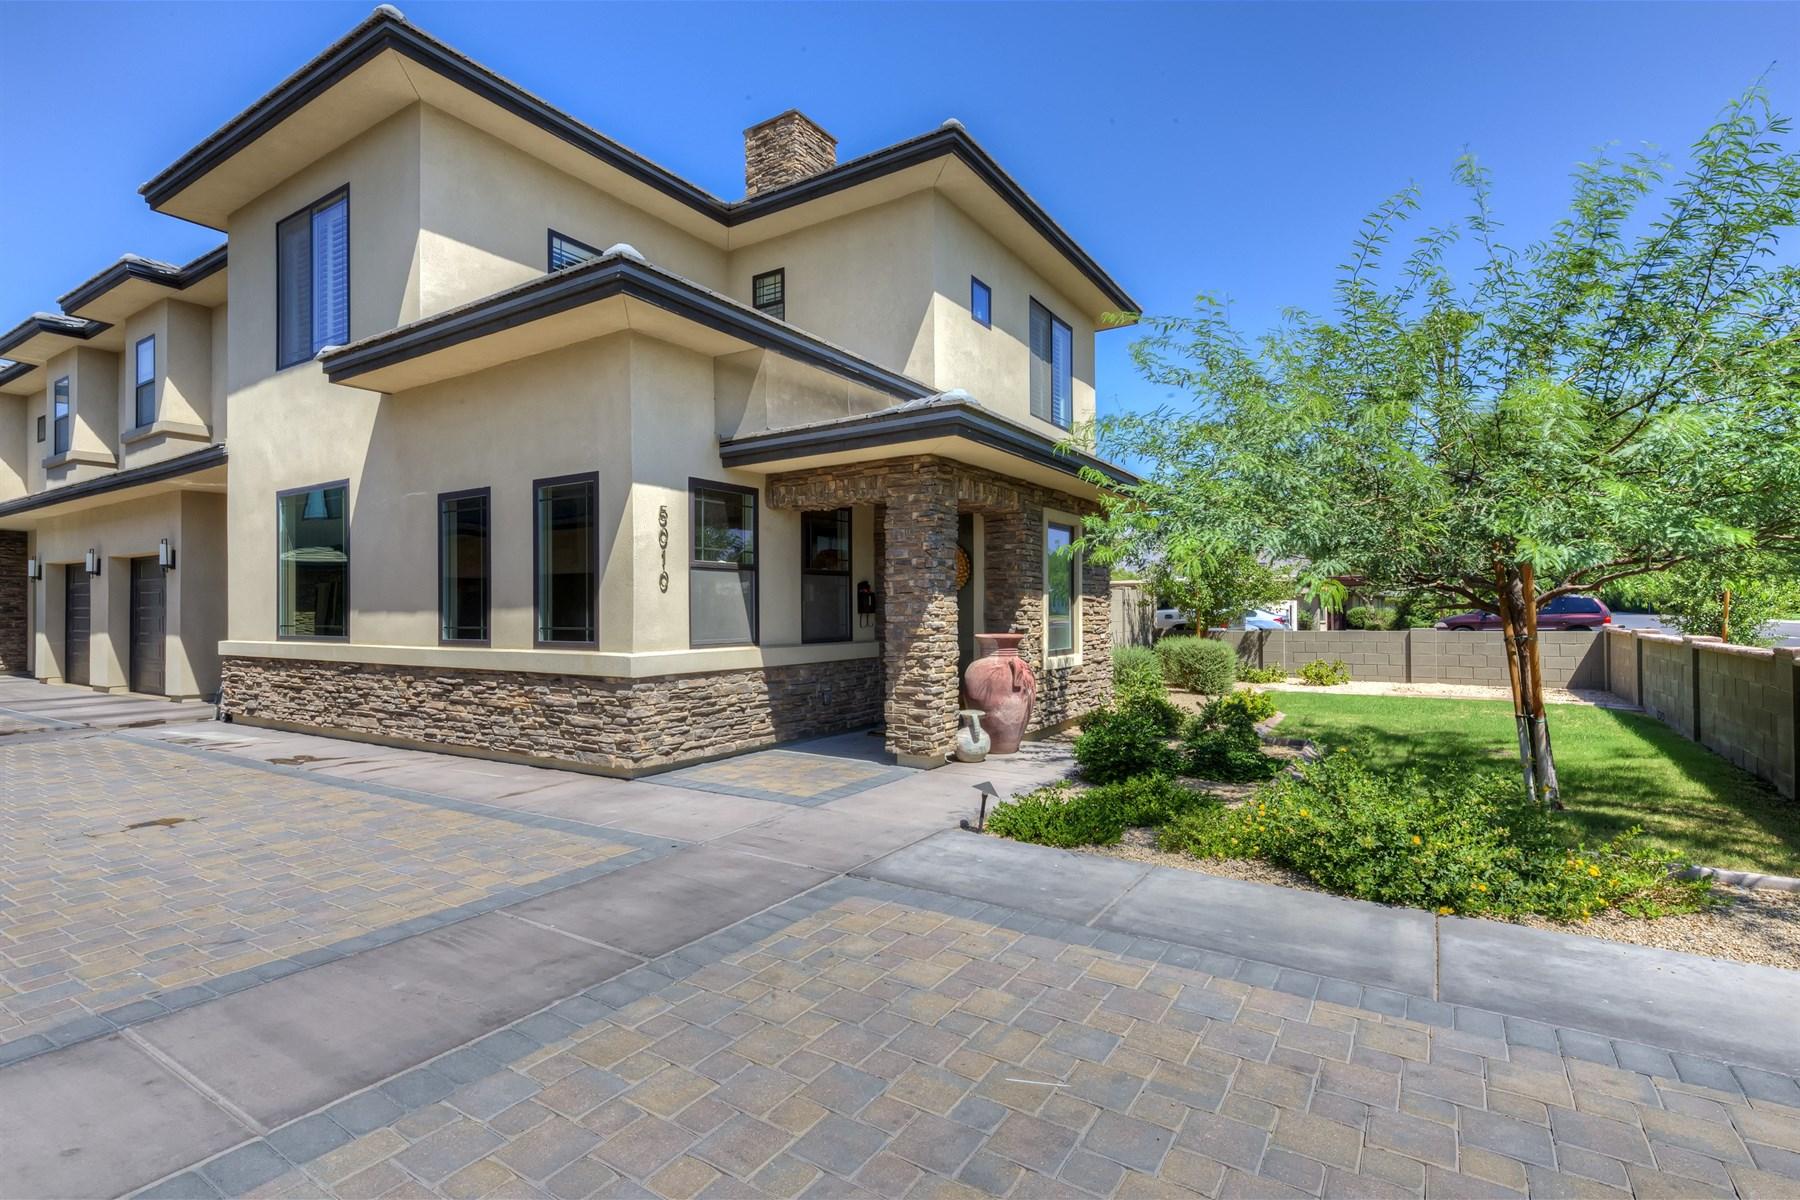 Таунхаус для того Продажа на Nearly New & Very Special Townhome in the Camelback/Biltmore Corridor 5010 N 34th Street #1 Phoenix, Аризона 85018 Соединенные Штаты